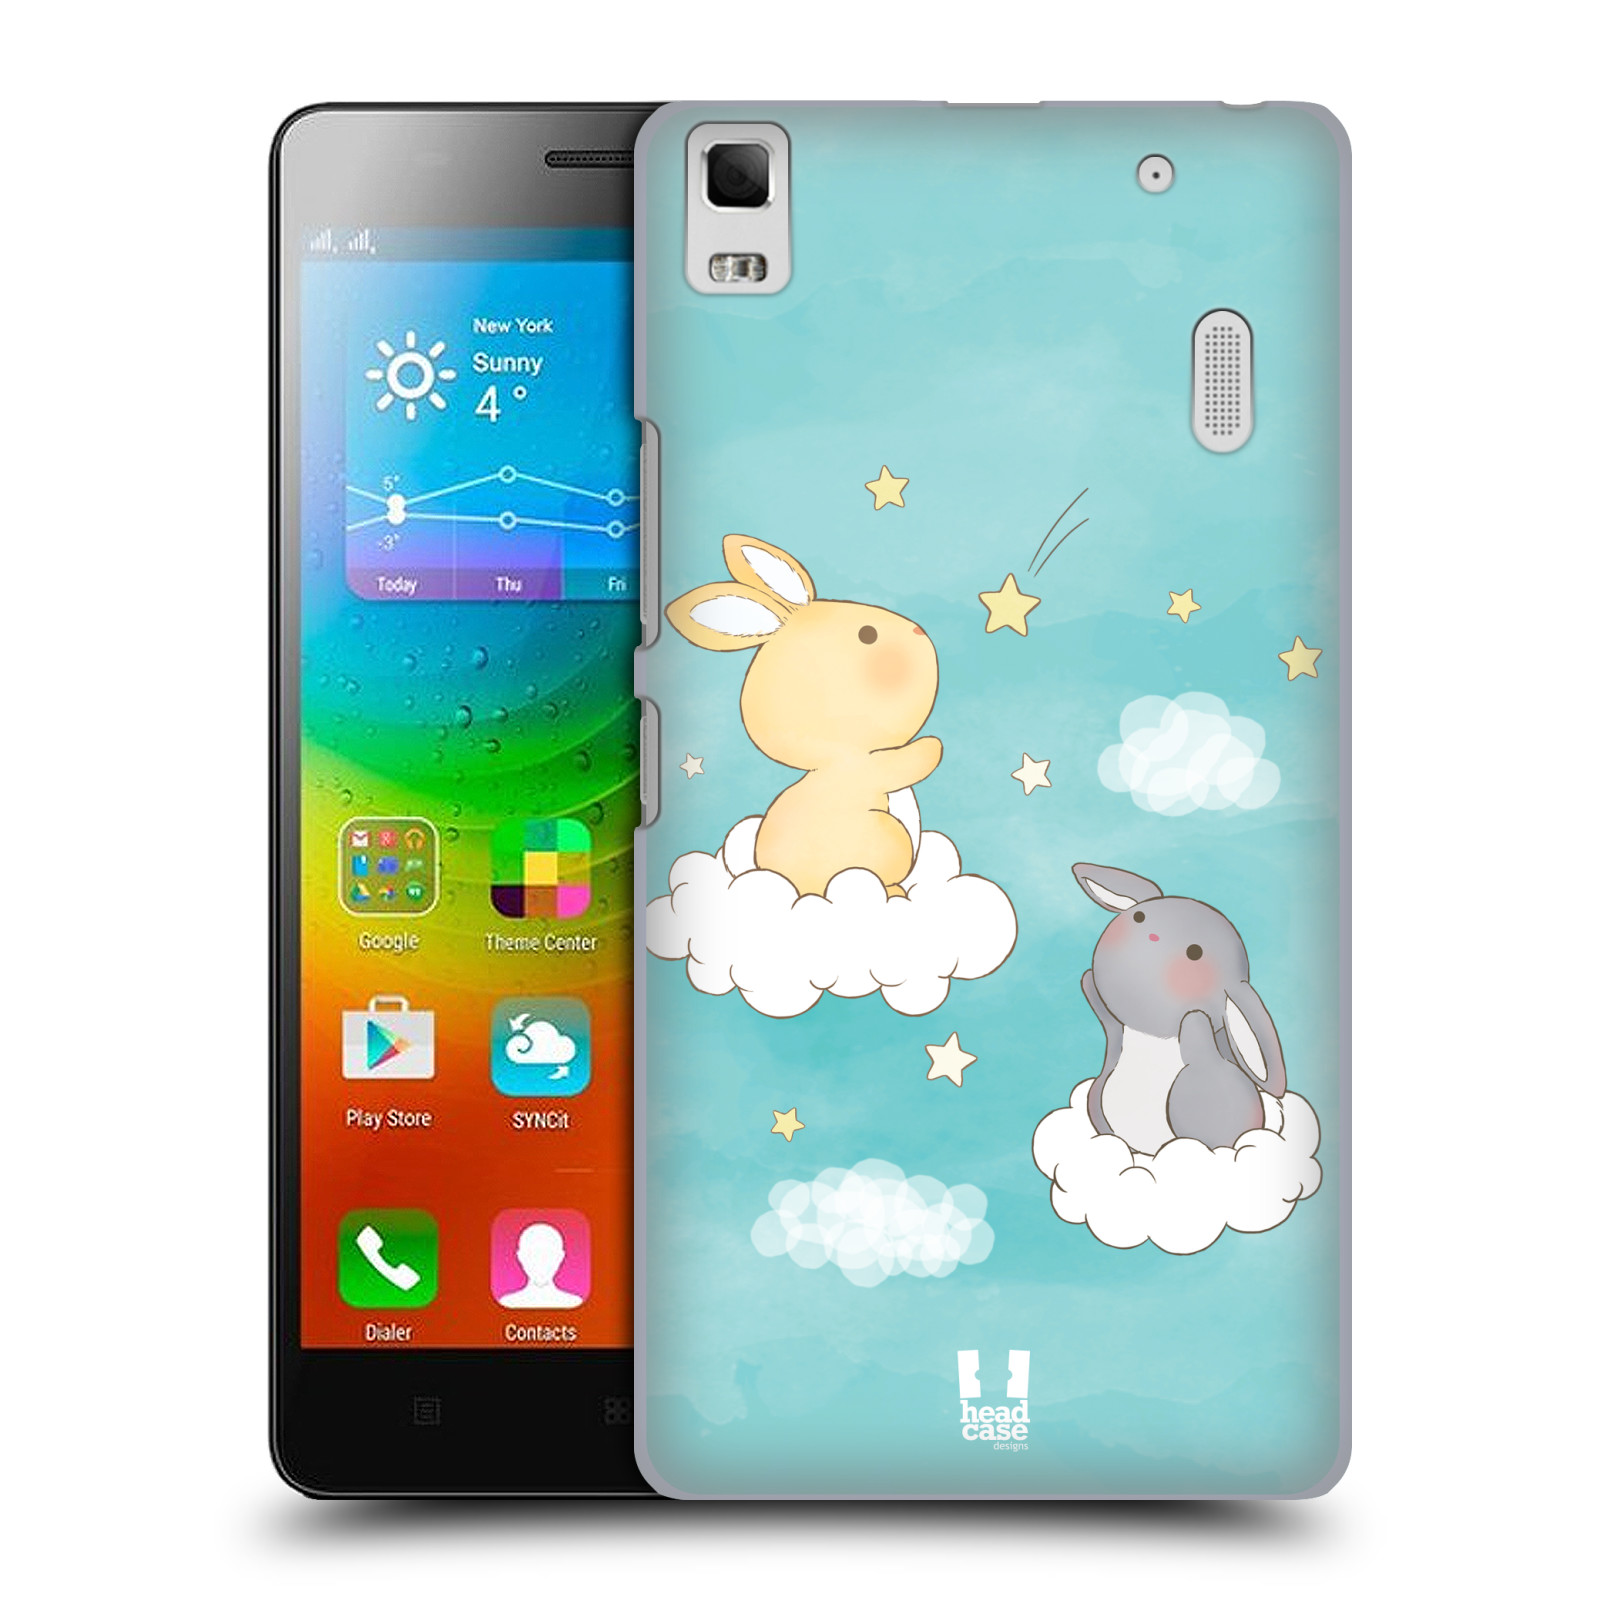 HEAD CASE pevný plastový obal na mobil LENOVO A7000 / A7000 DUAL / K3 NOTE vzor králíček a hvězdy modrá